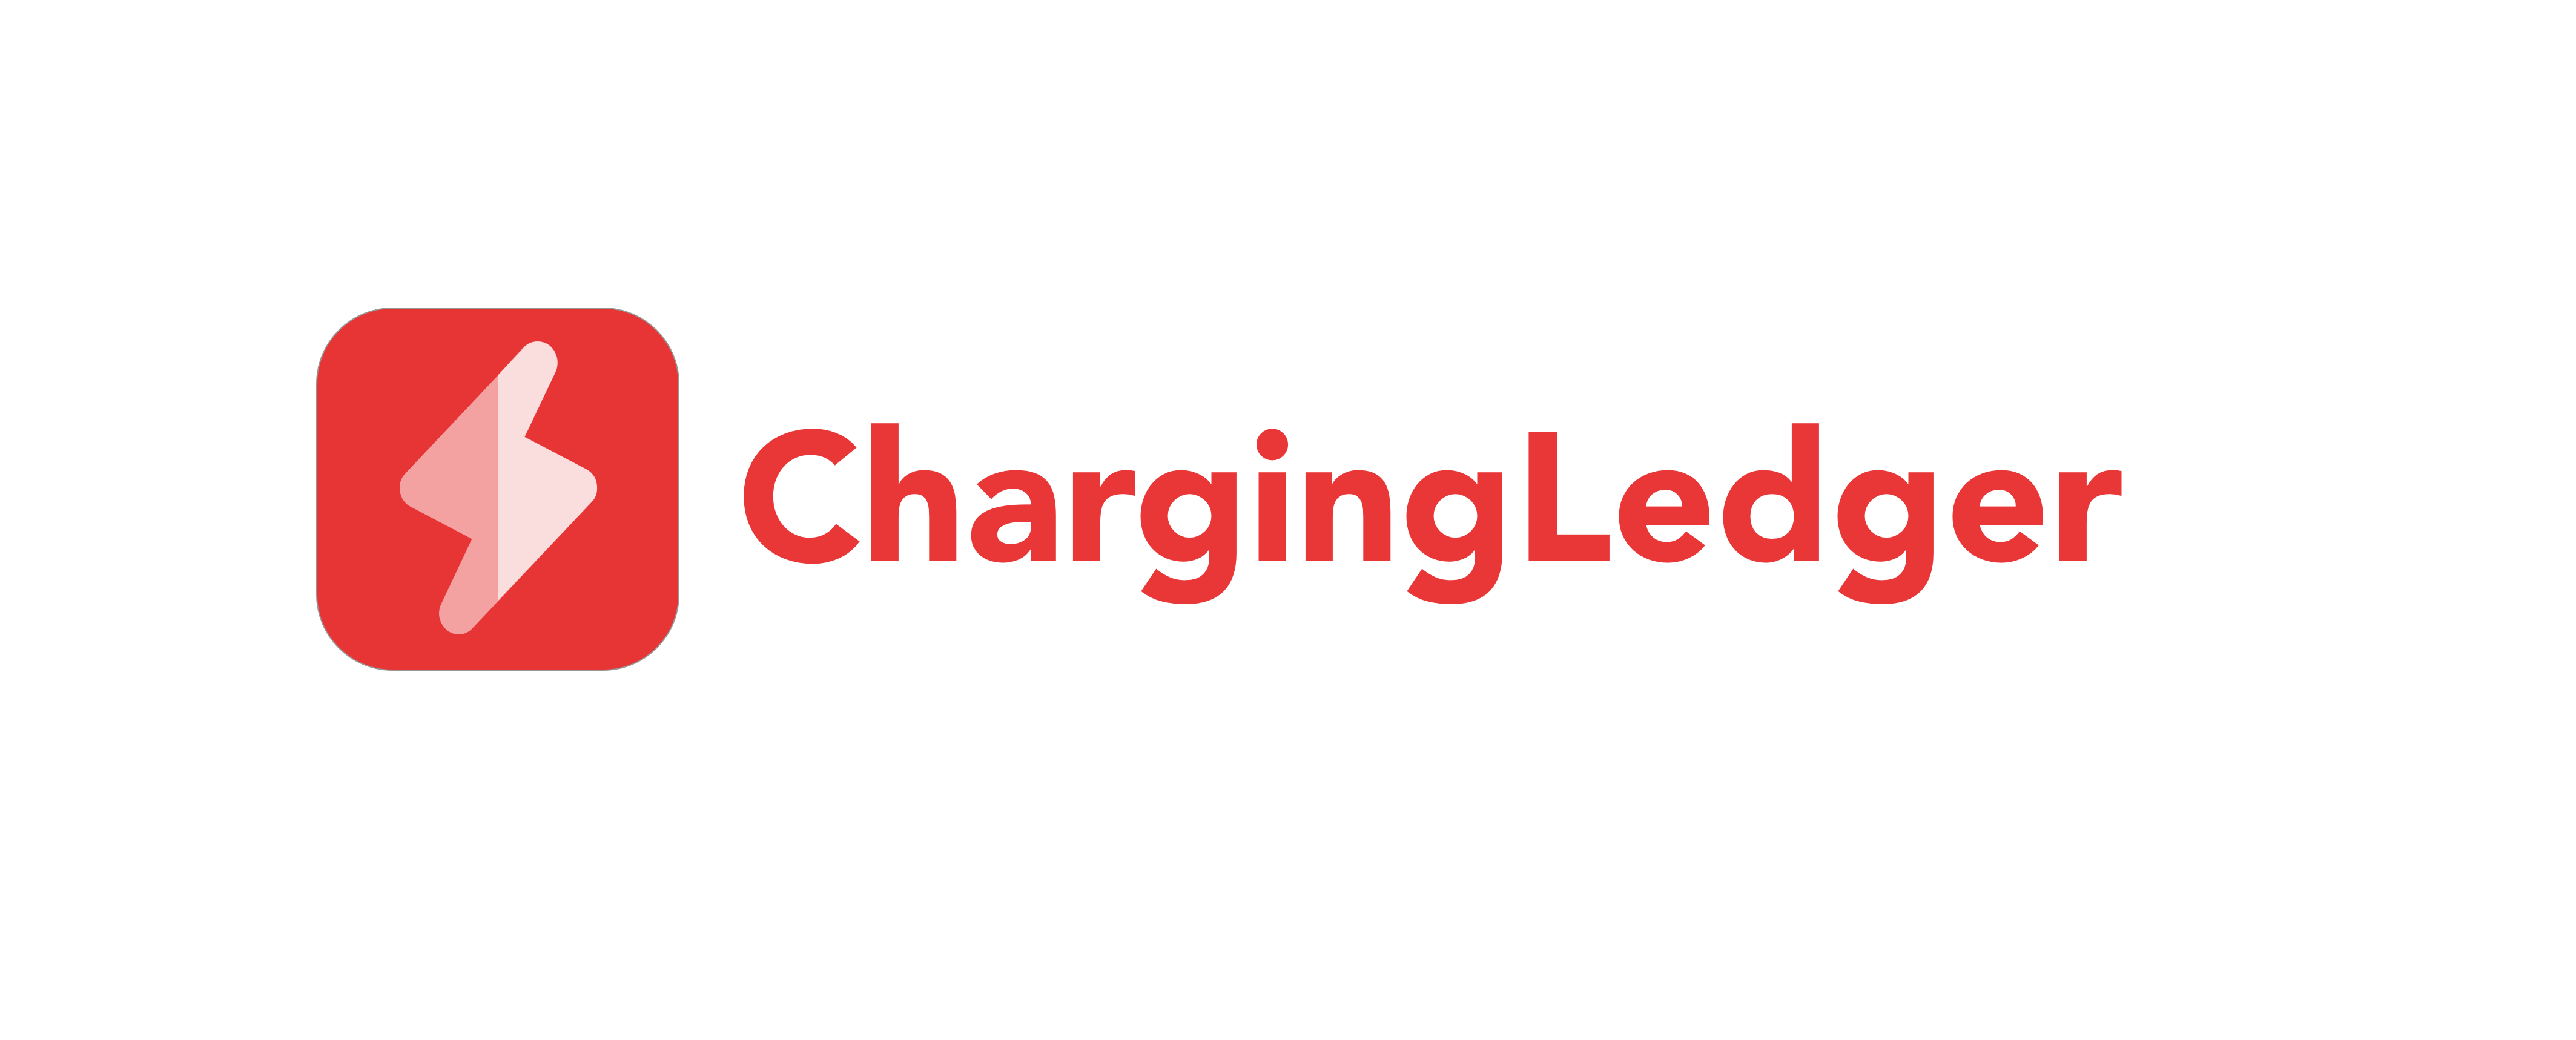 ChargingLedger